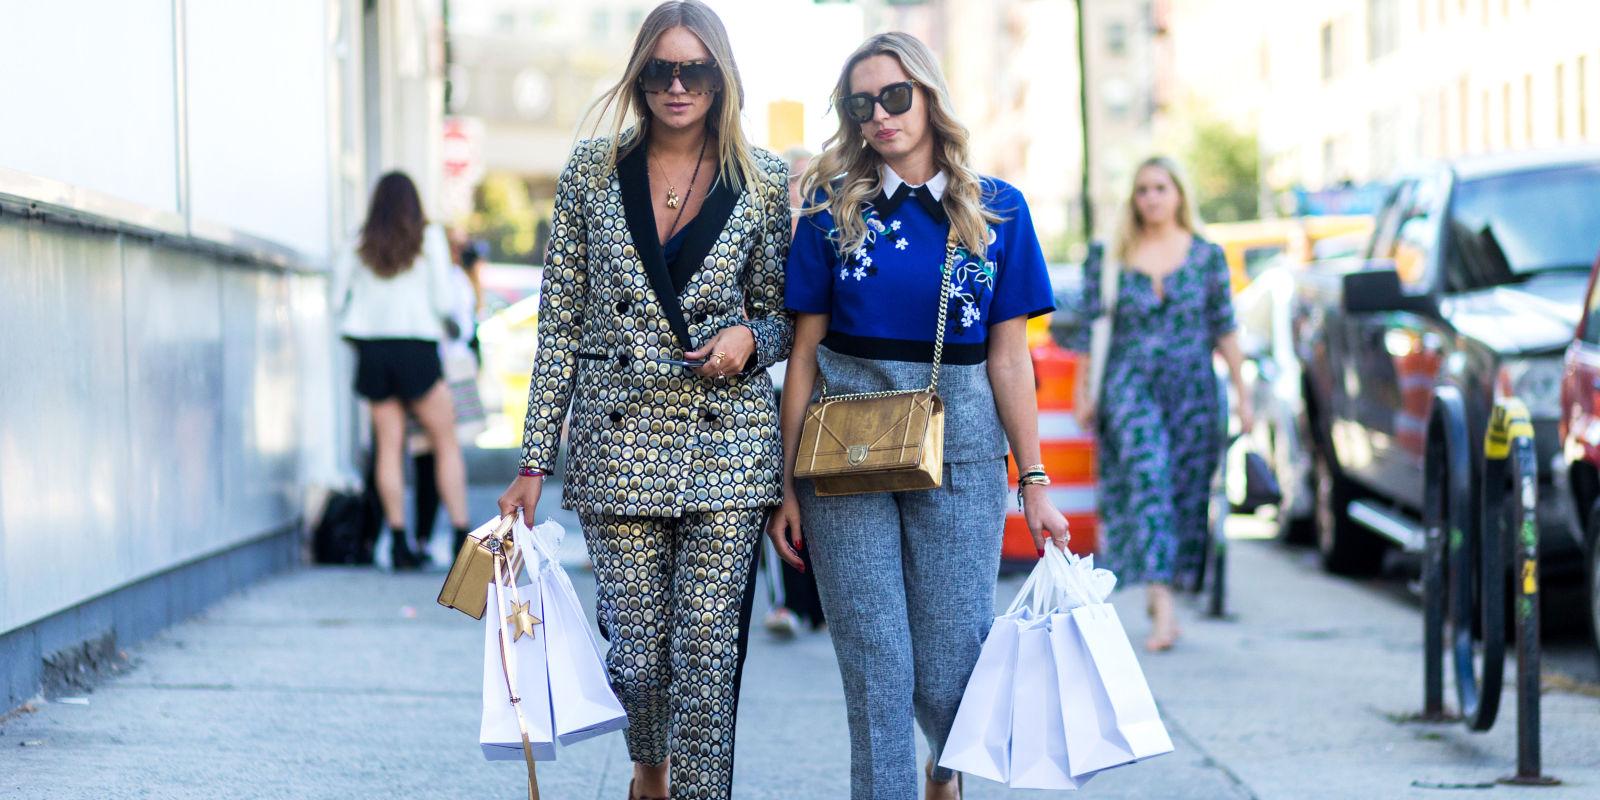 shopping australia clothes clothing stores landscape popsugar glamour